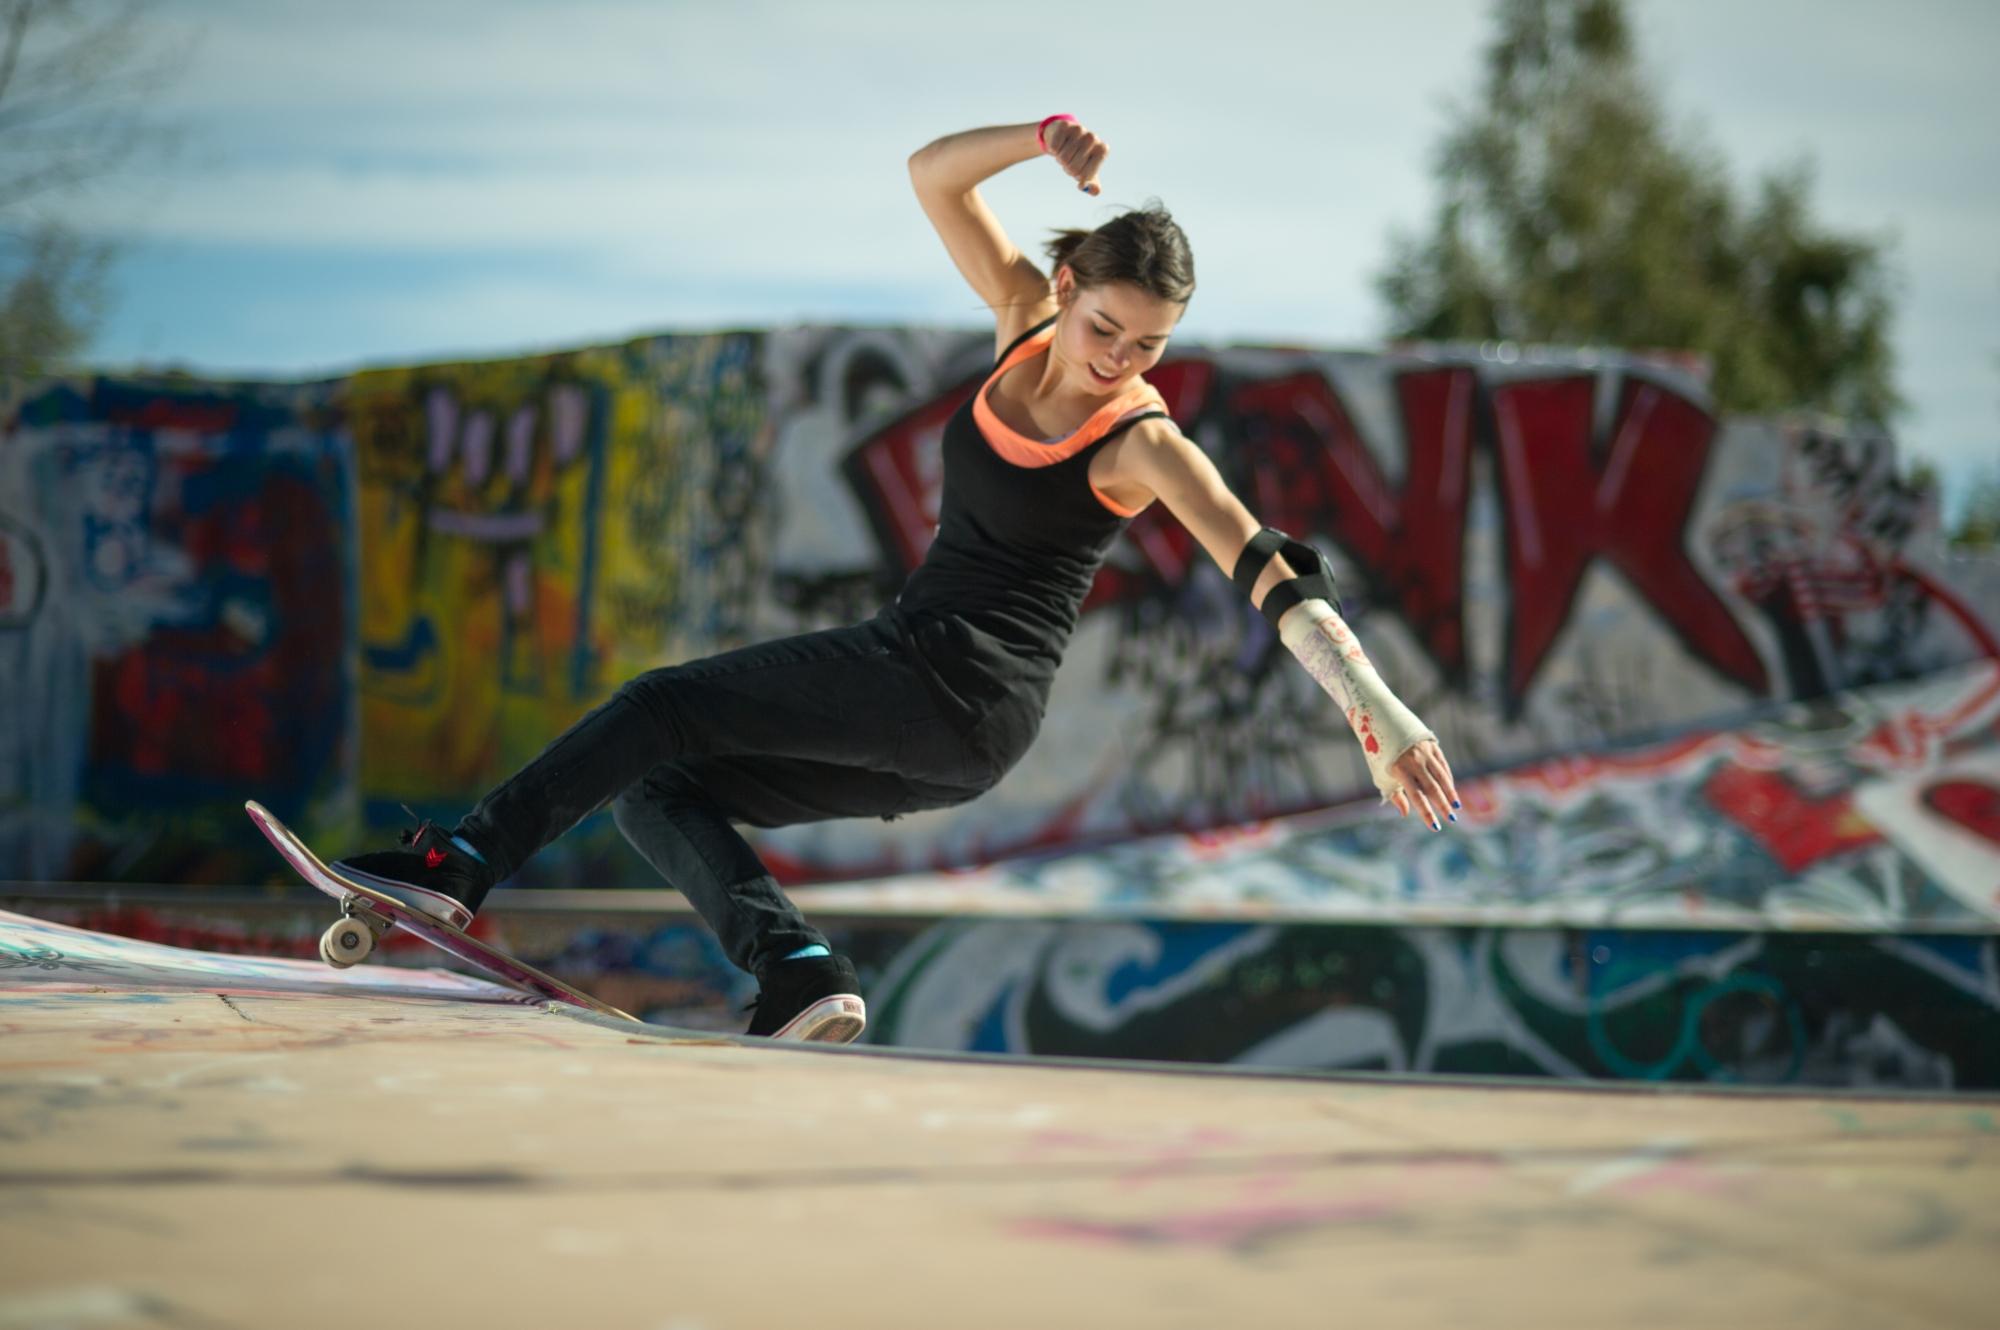 Amelia Brodkha skateboarder